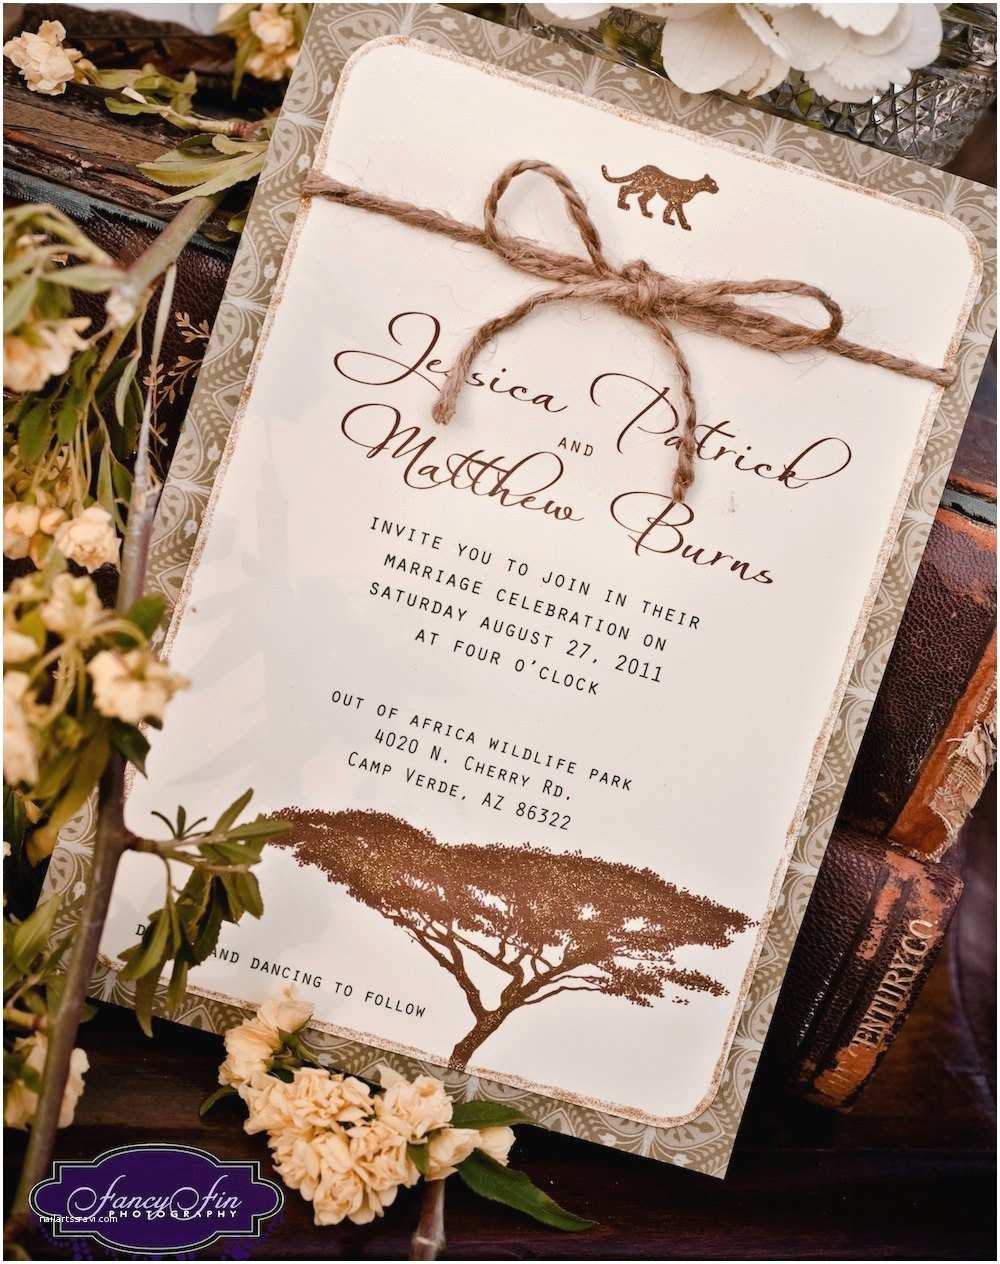 African themed Wedding Invitations Vintage Desert Safari Wedding Invitations Hand Painted and